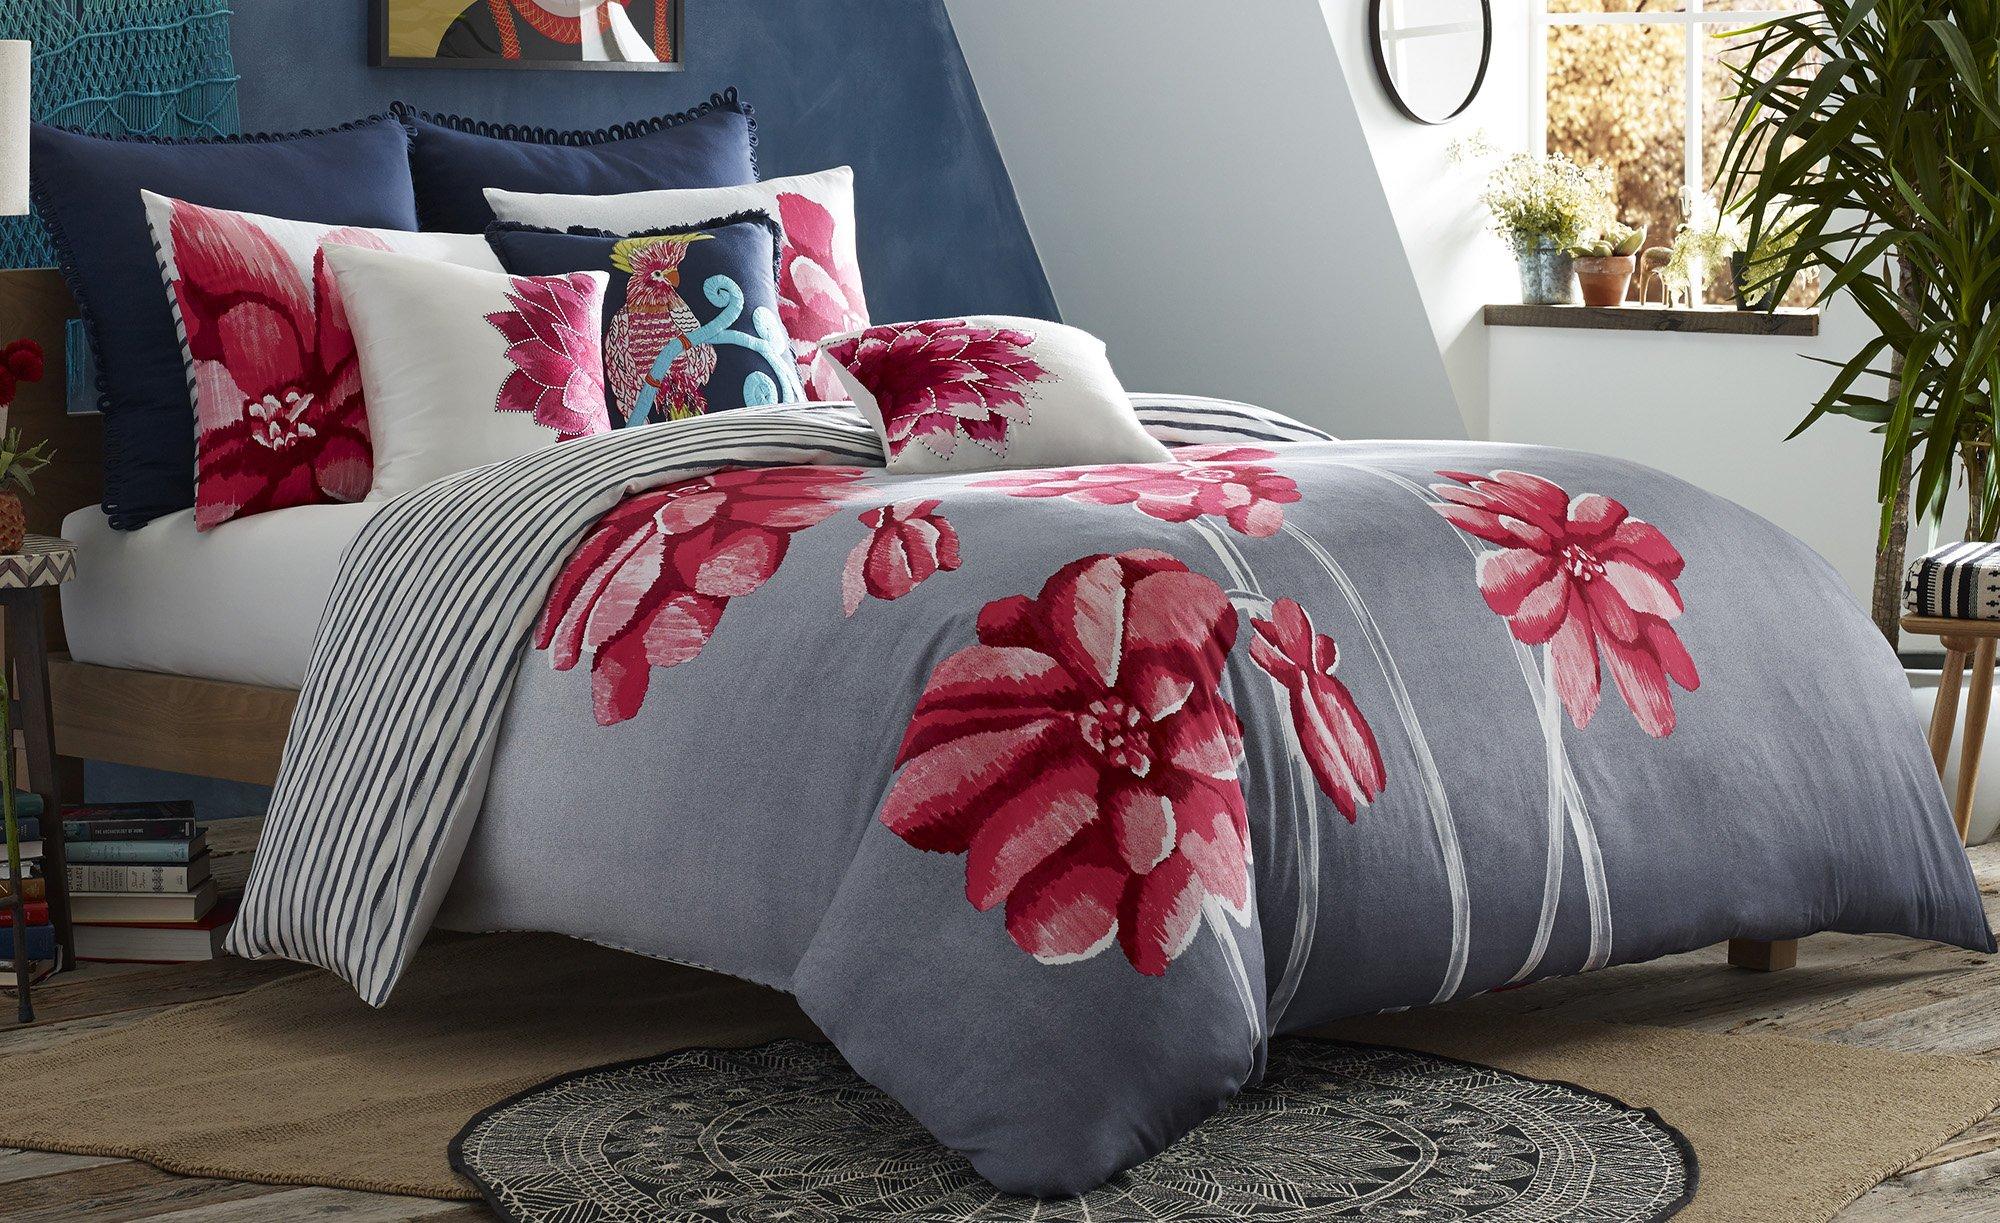 Blissliving Home 14827BEDDQUEMUL Frida 92-Inch by 96-Inch 3 Piece Queen Duvet Set, Multi